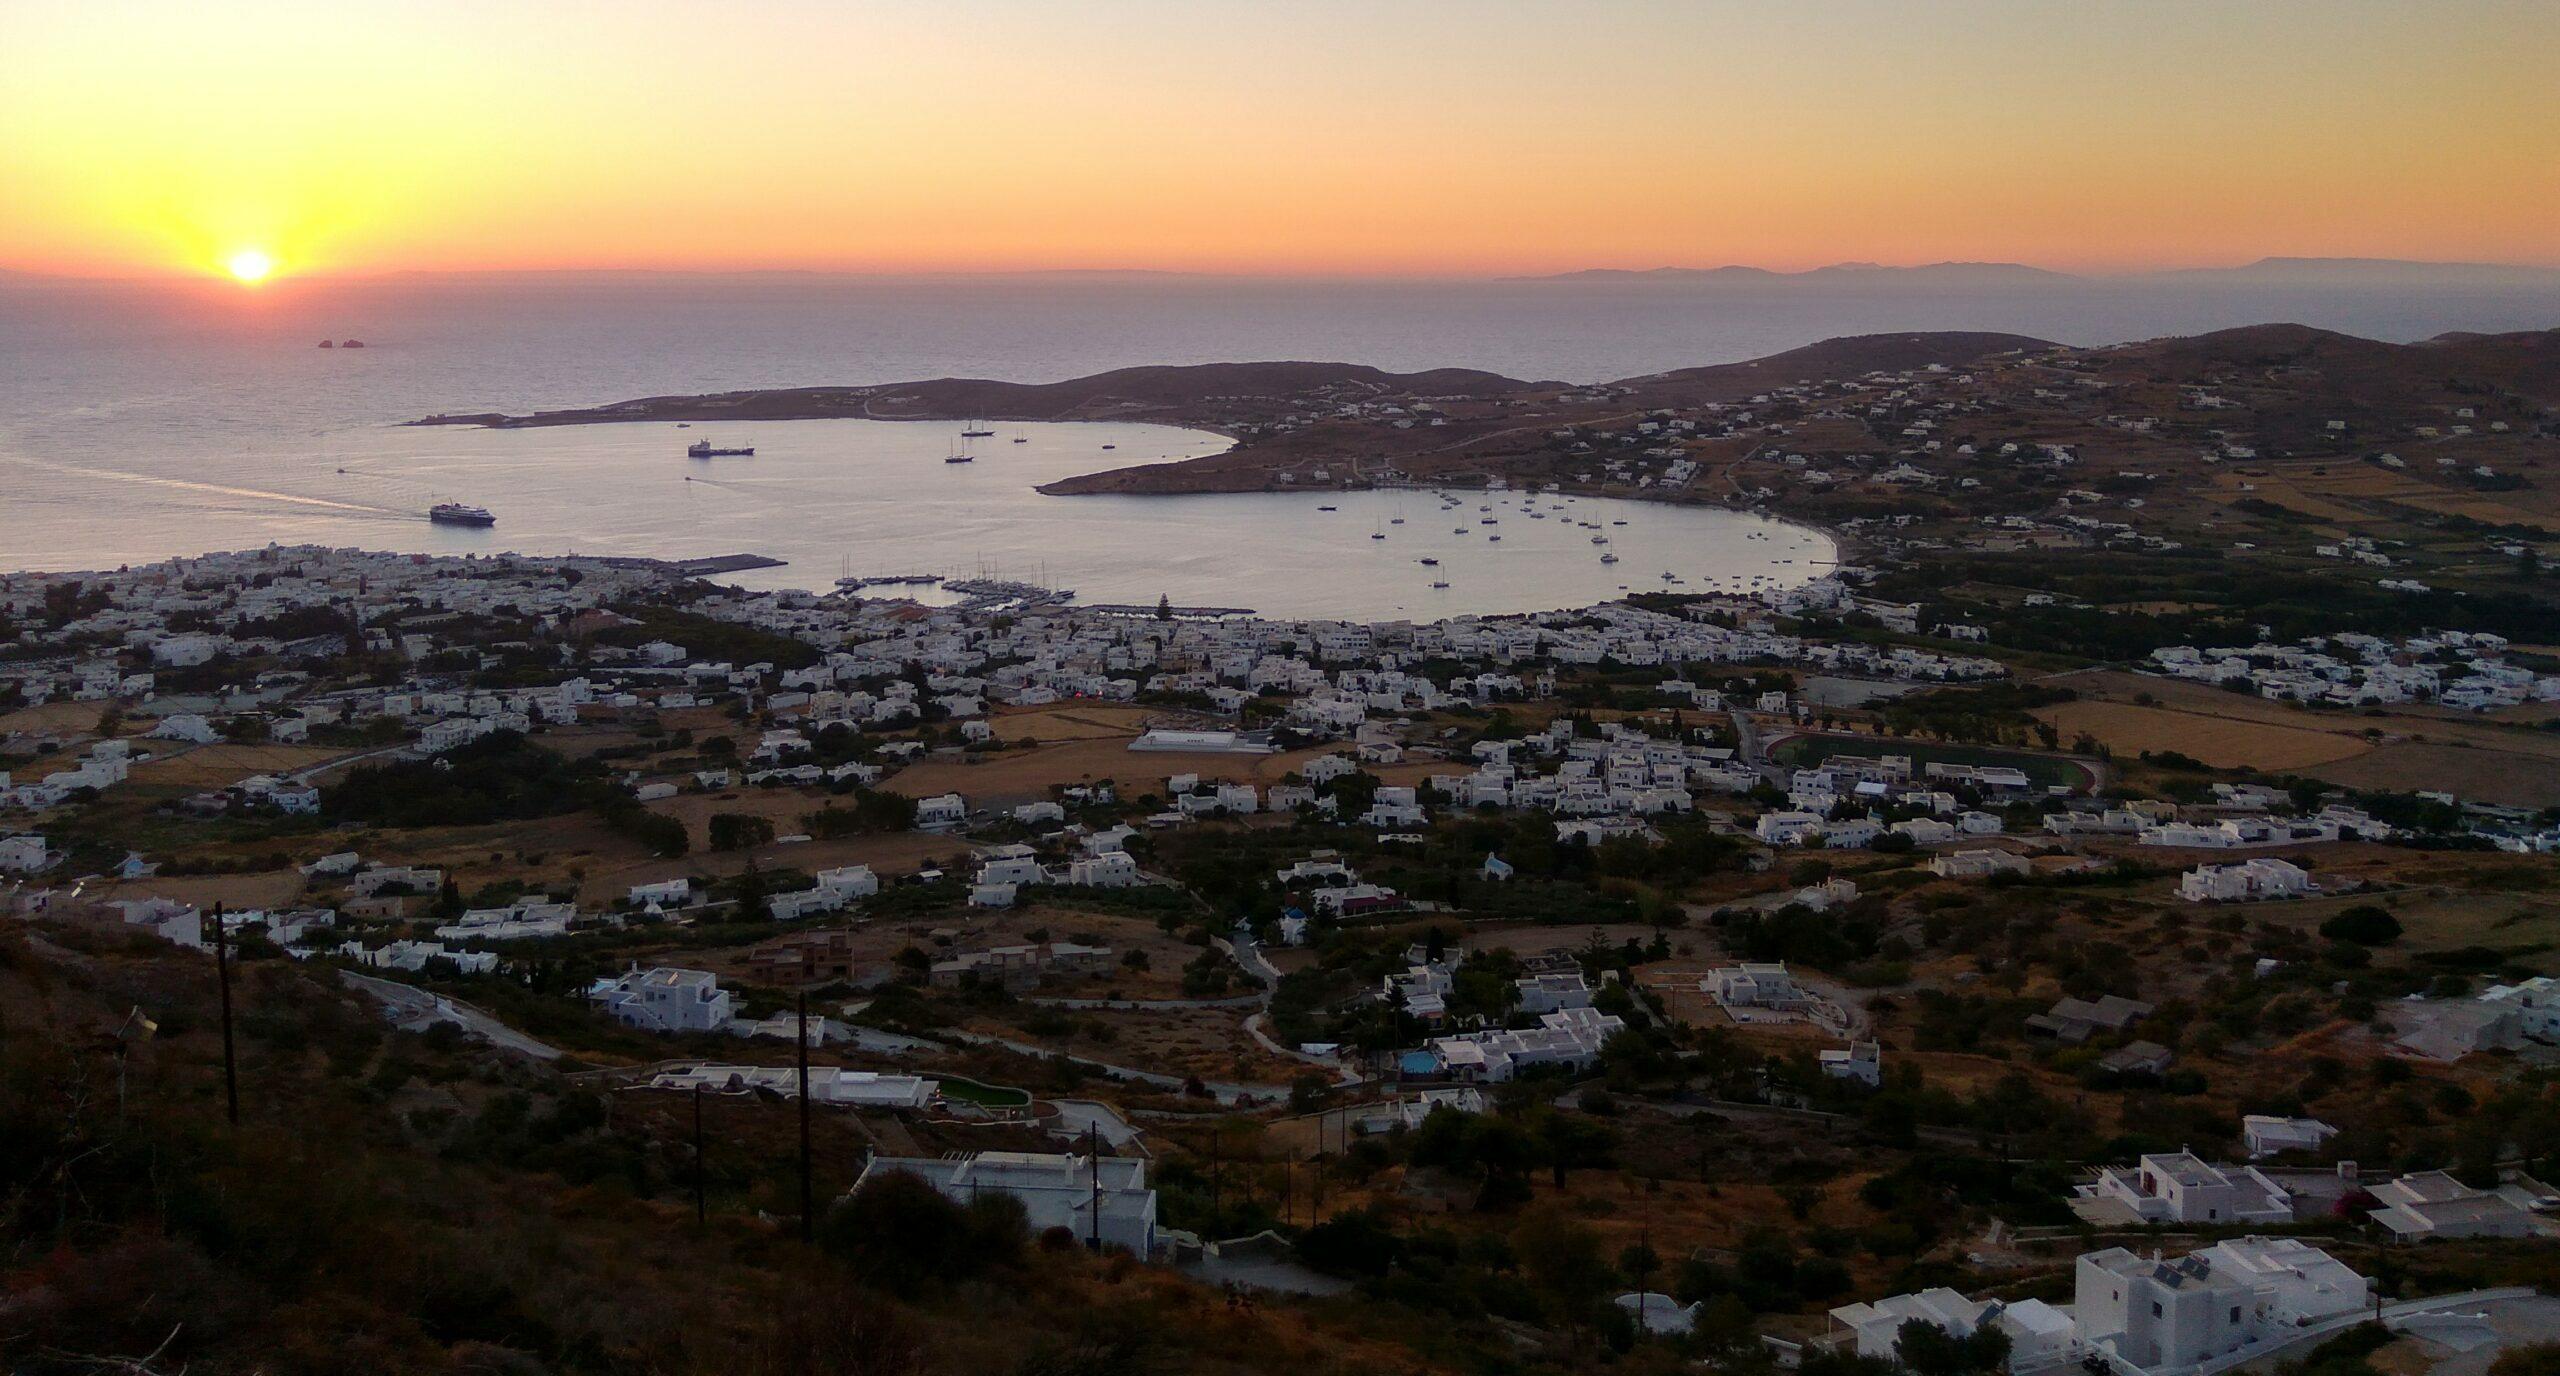 Paros: The beautiful Parikia in the heart of the Aegean Sea